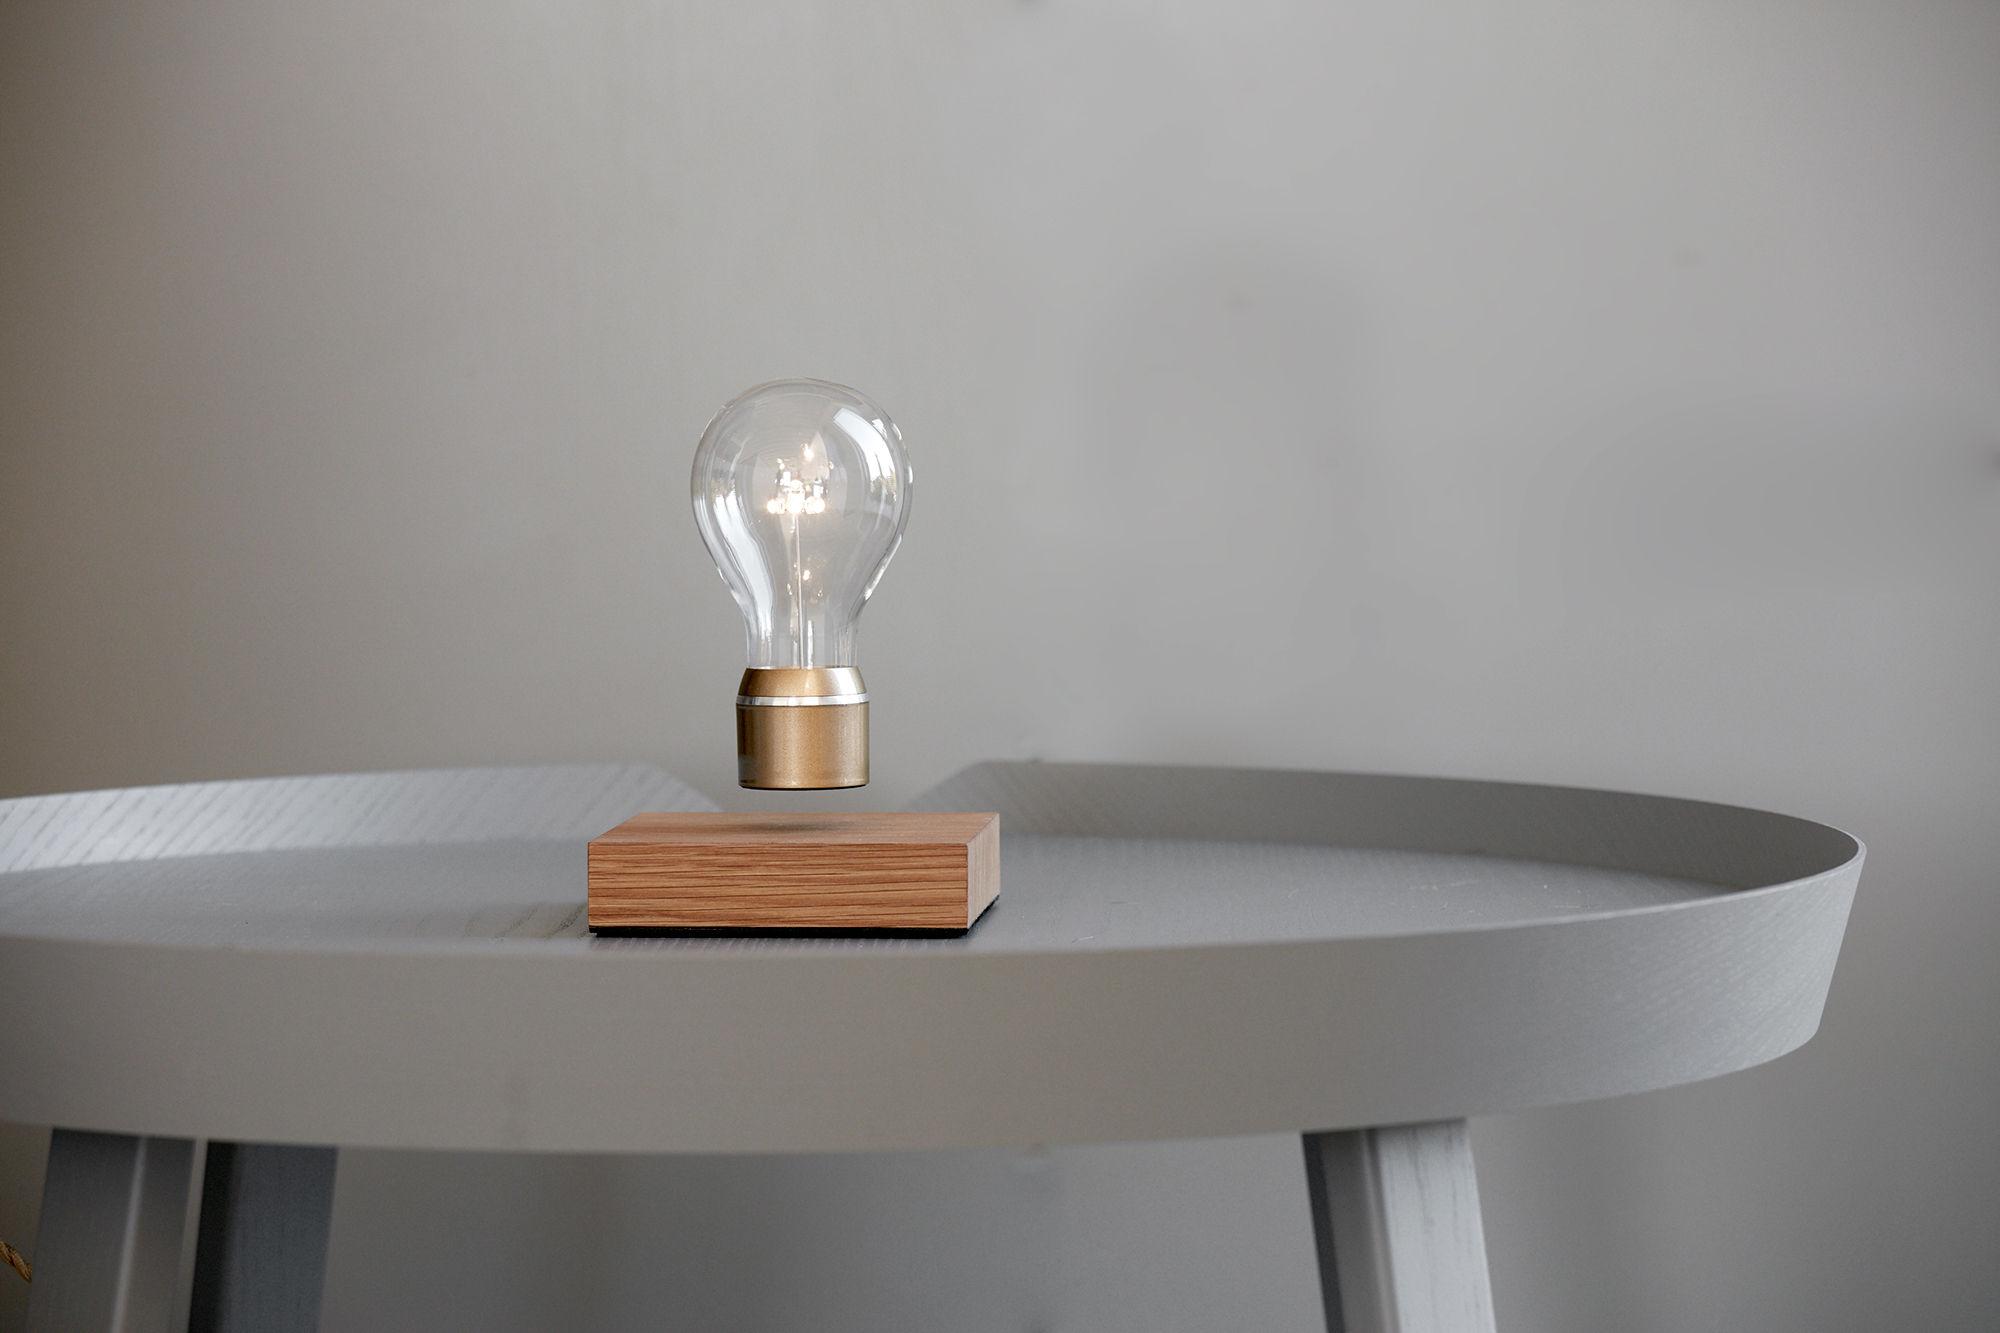 Tre lampade da tavolo by stilux on artnet